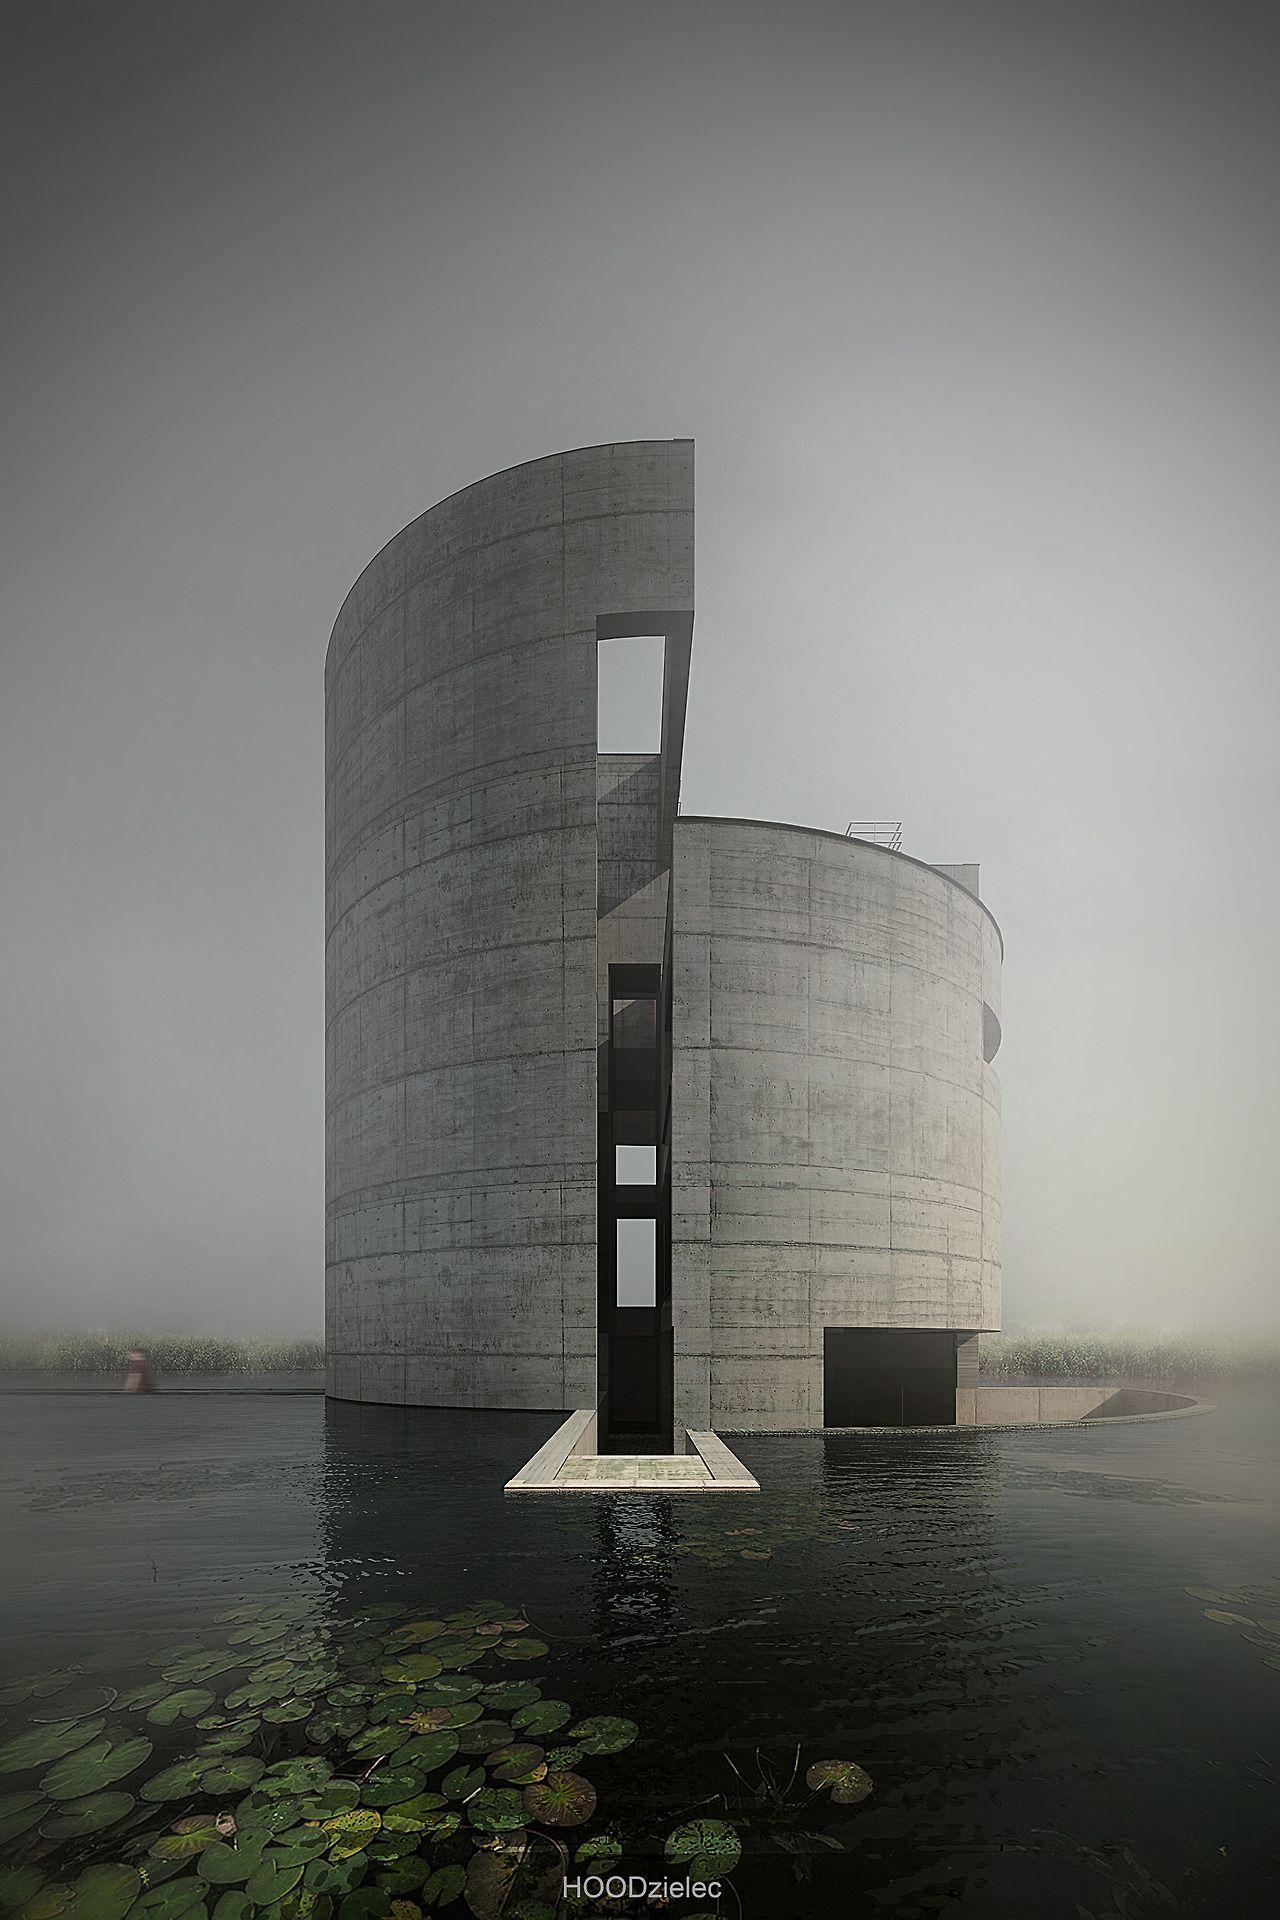 Hoodzielec Brutalist Architecture Concrete Architecture Amazing Architecture